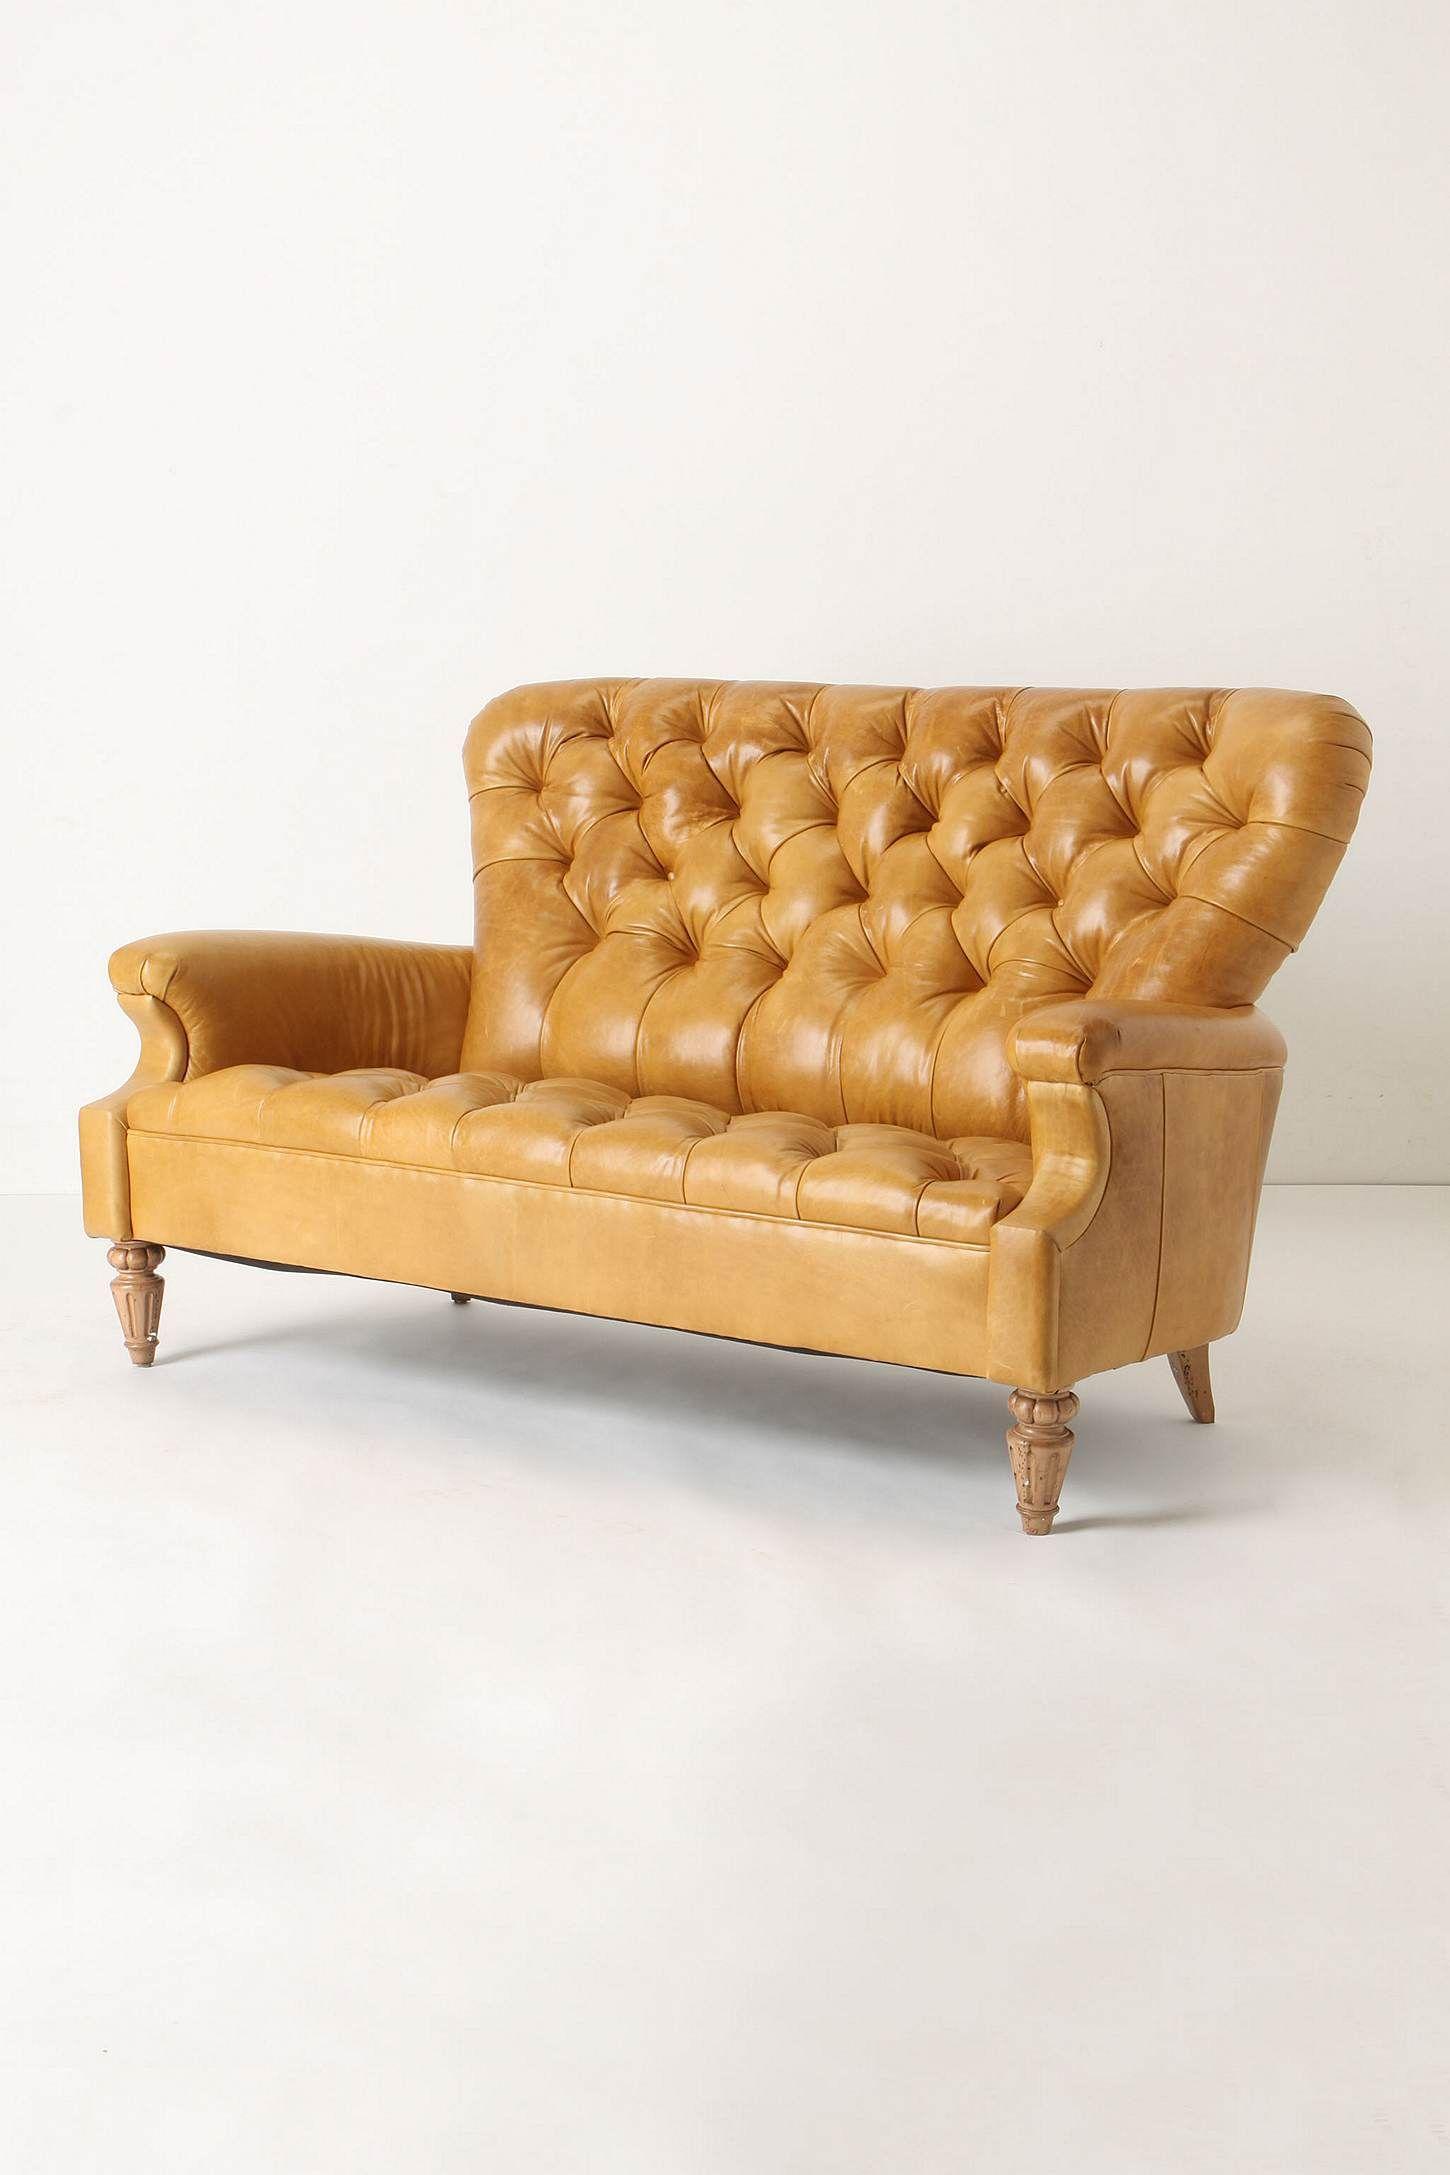 settee furniture designs. Explore Home Furniture, Furniture Design And More! Settee Designs